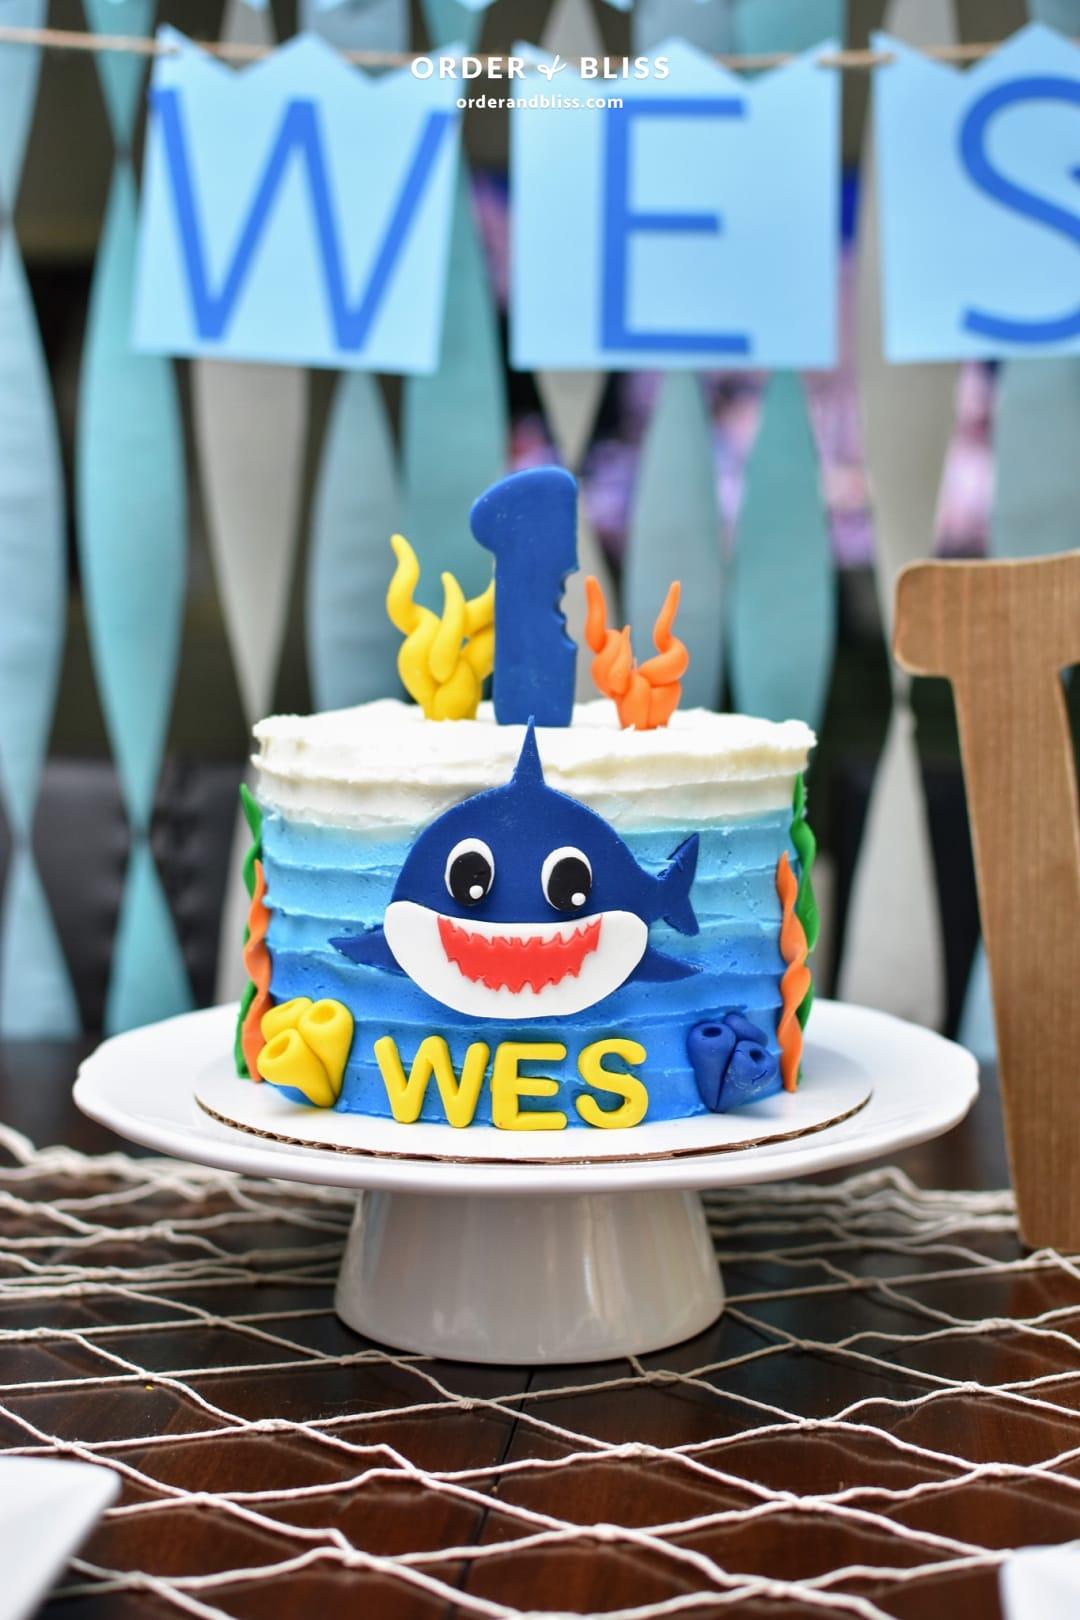 Wes Baby Shark Birthday Bash Home Organization Order Bliss